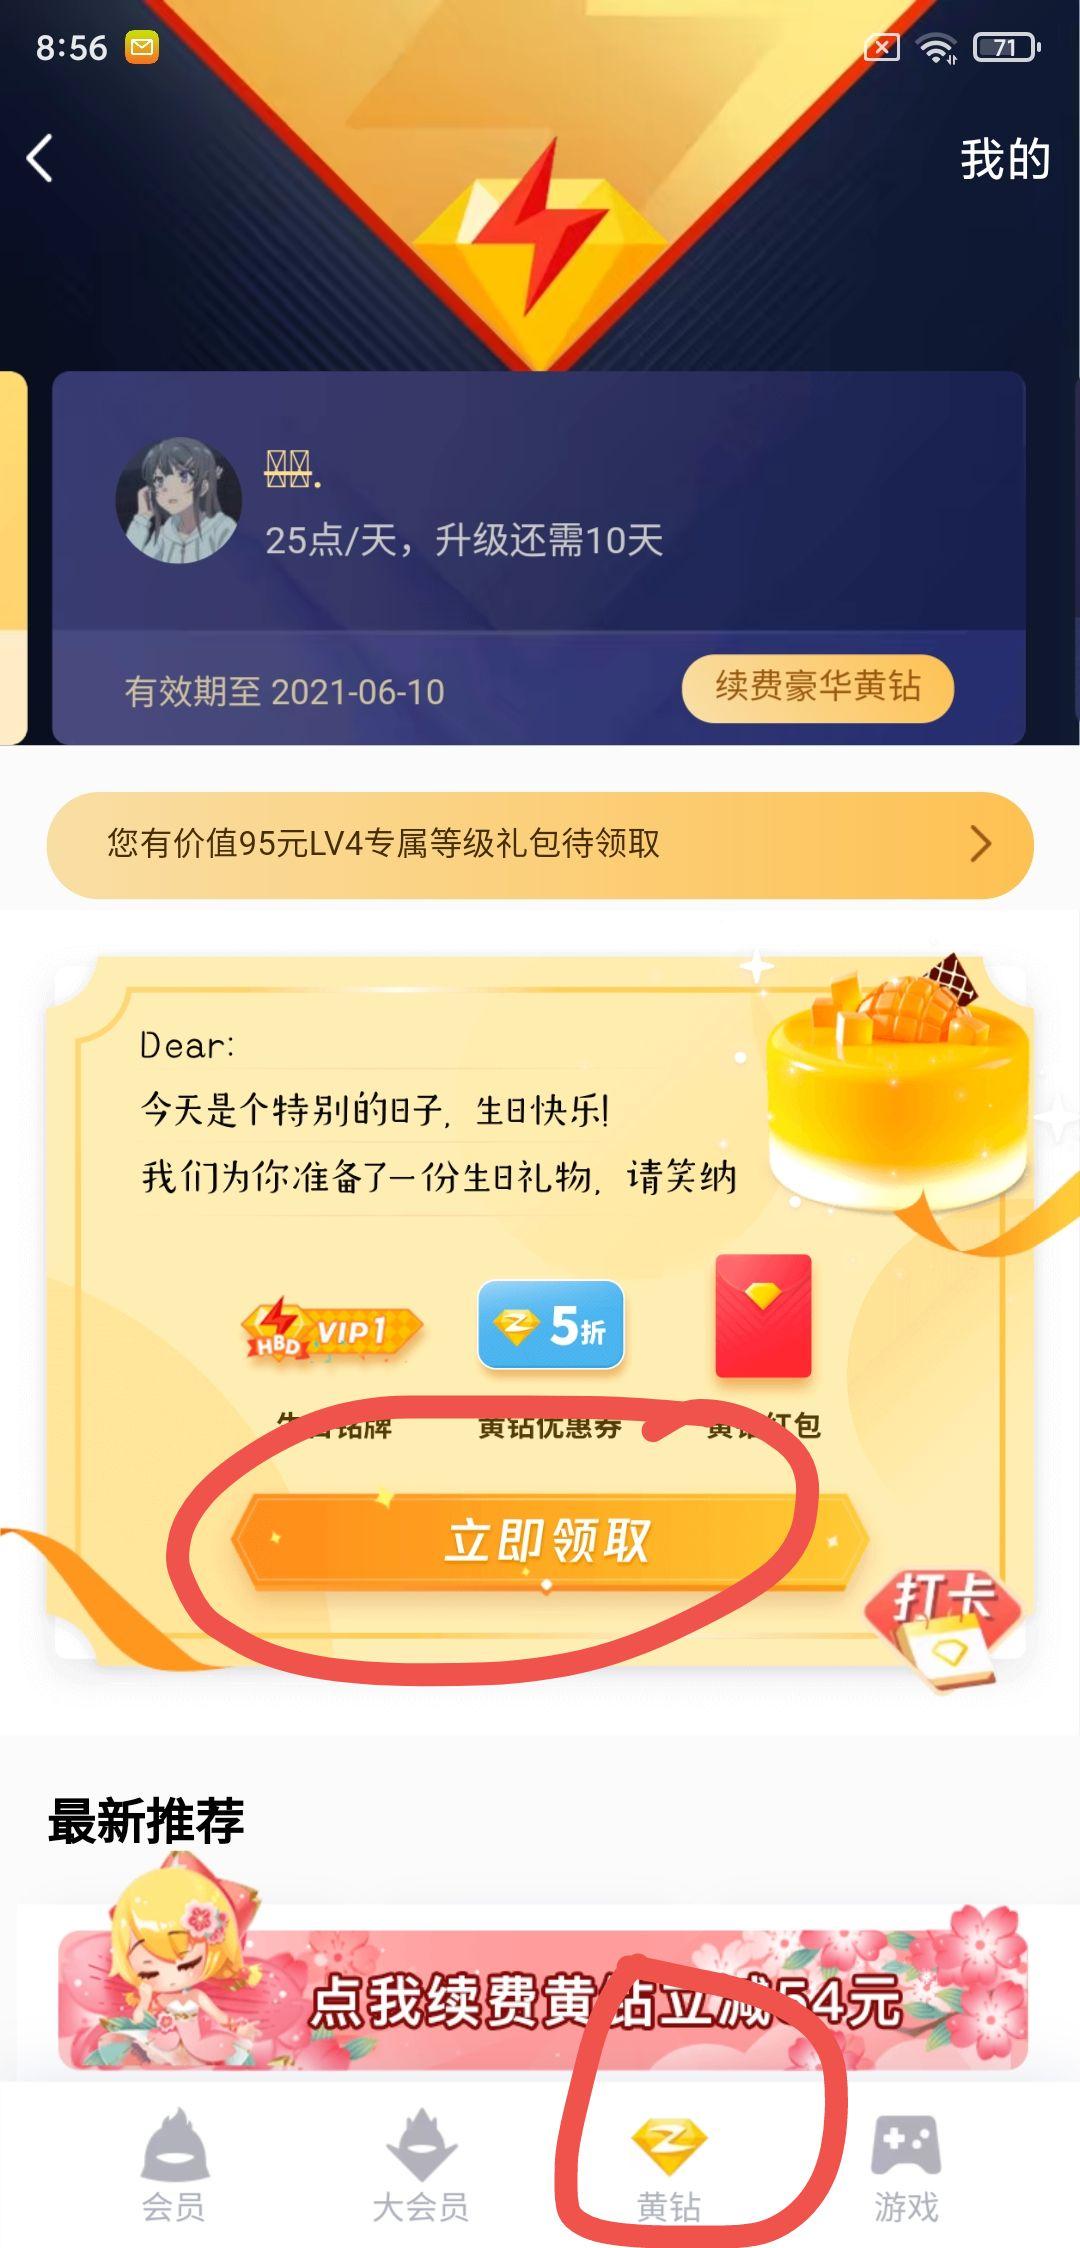 QQ免费无限撸黄钻教程!  QQ免费无限撸黄钻教程 第3张